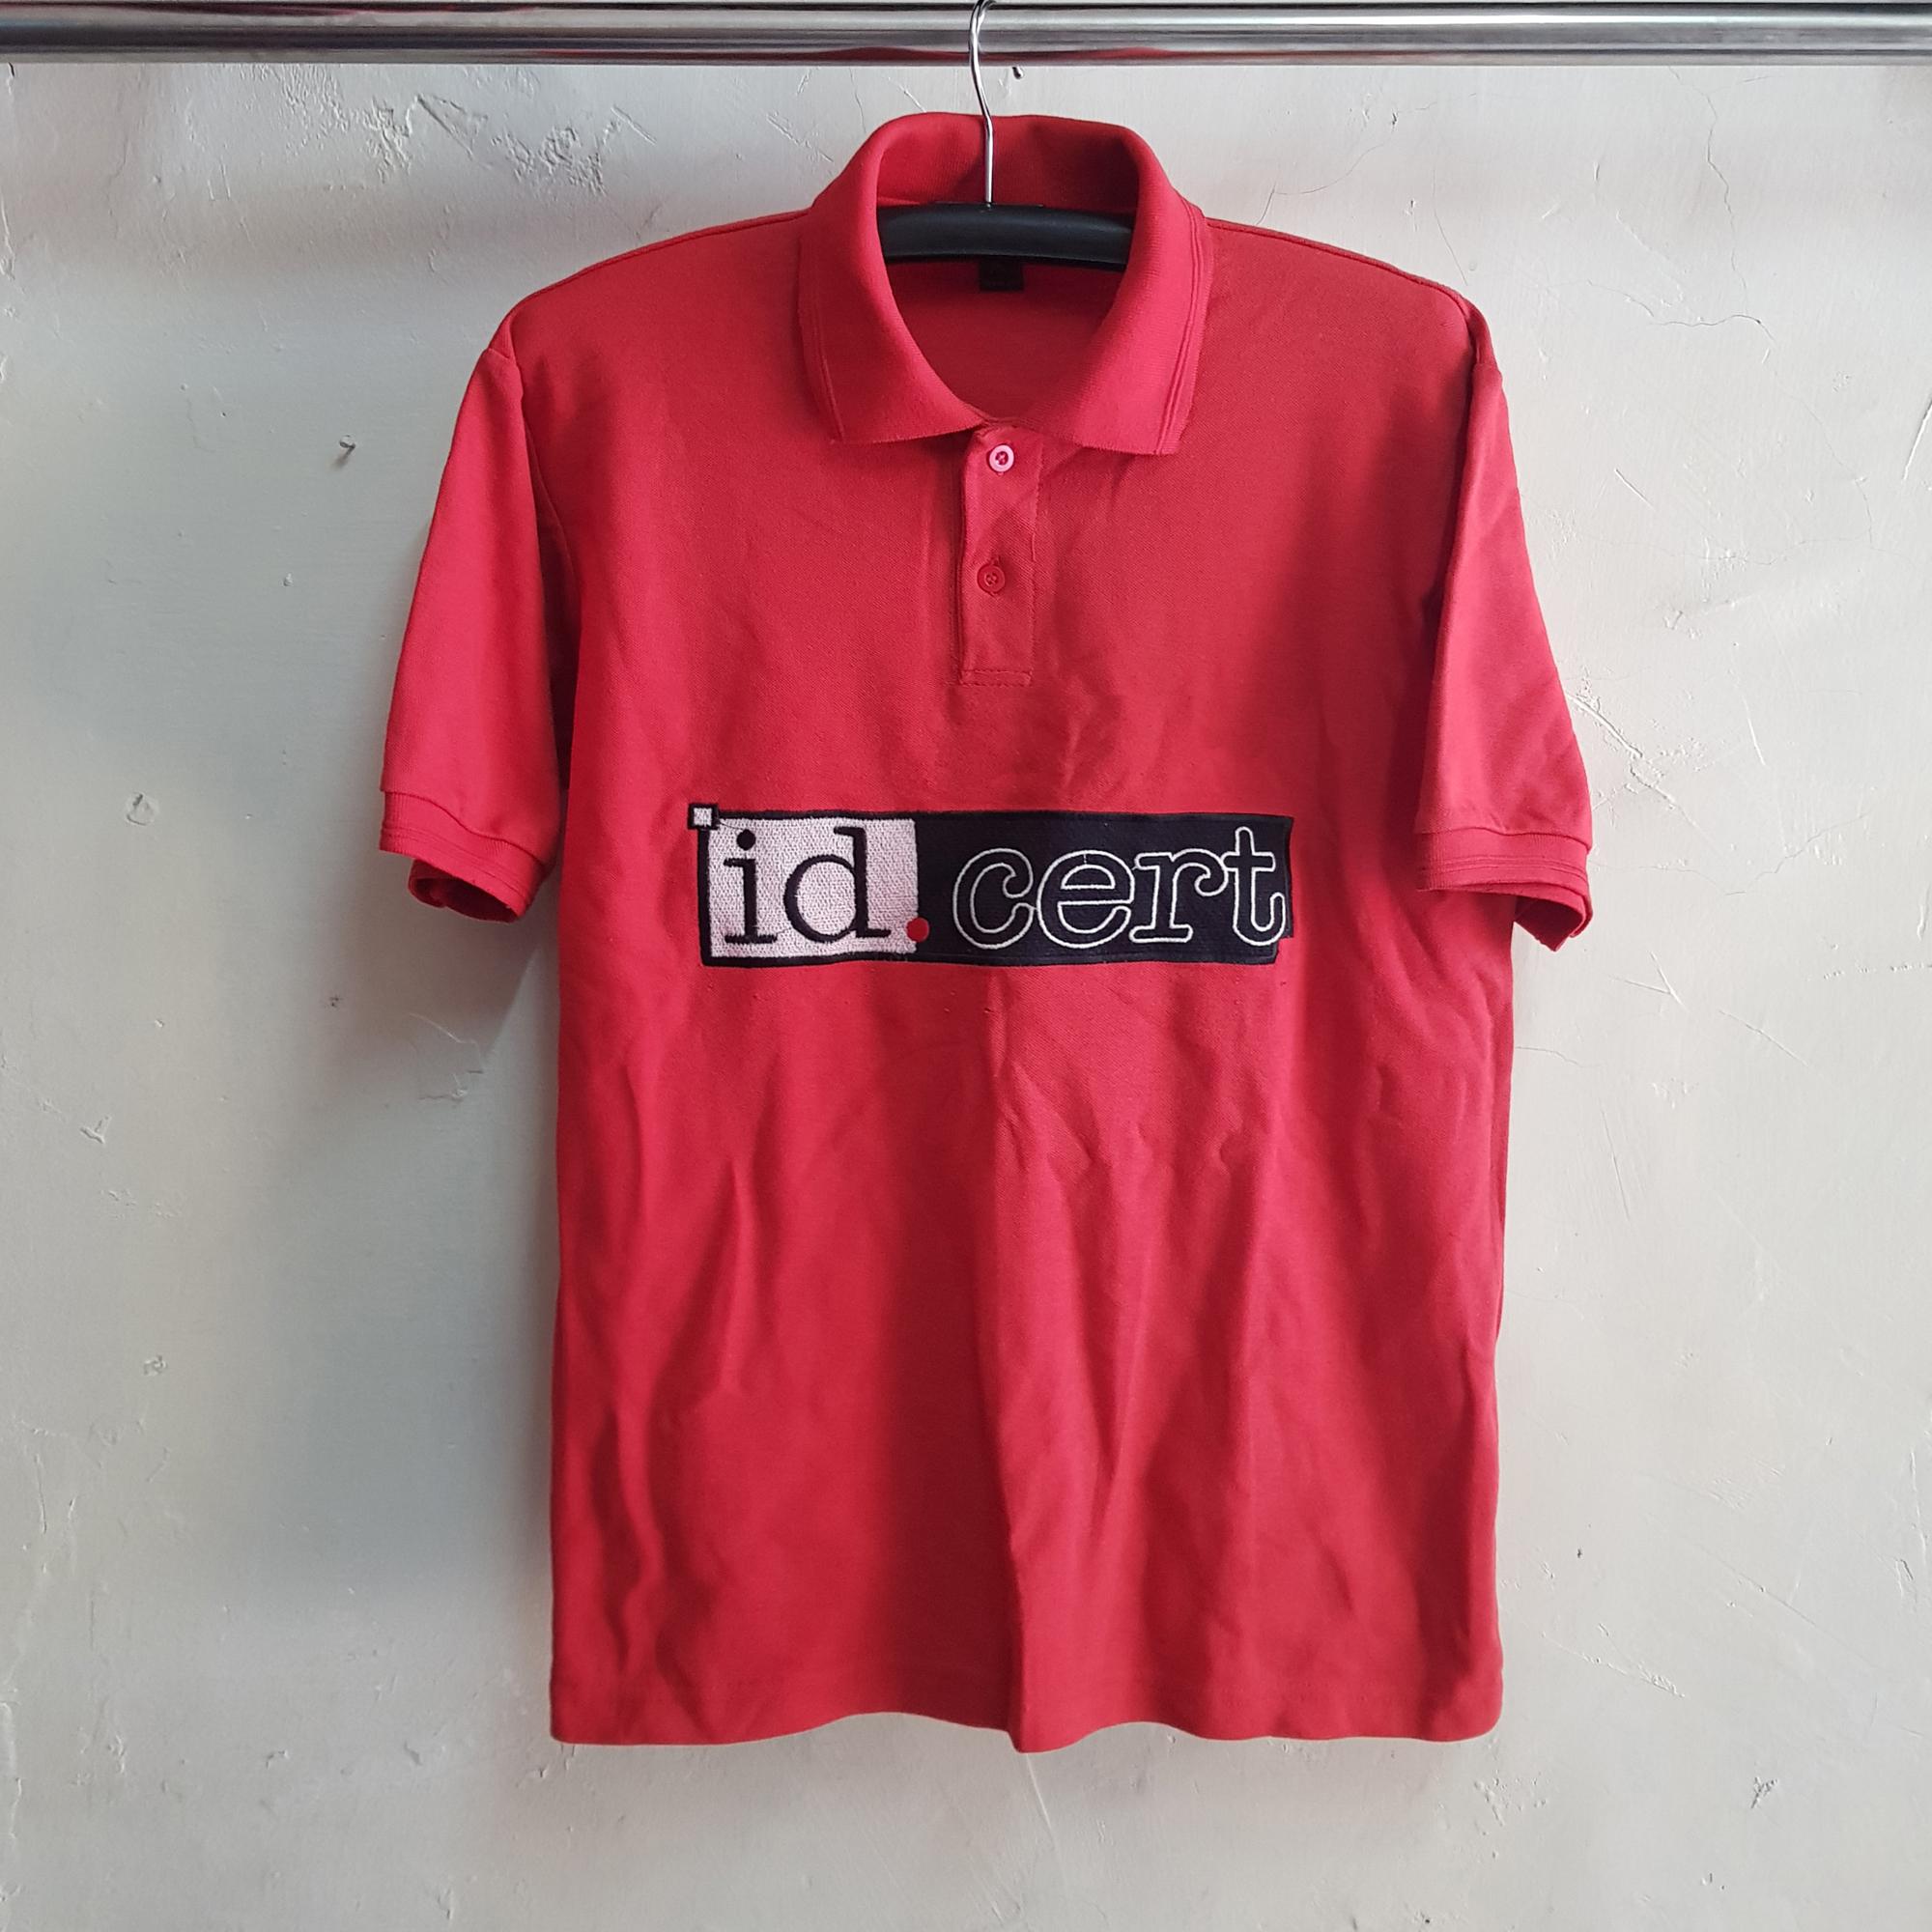 Poloshirt Lacoste CVC, Seragam Id Cert